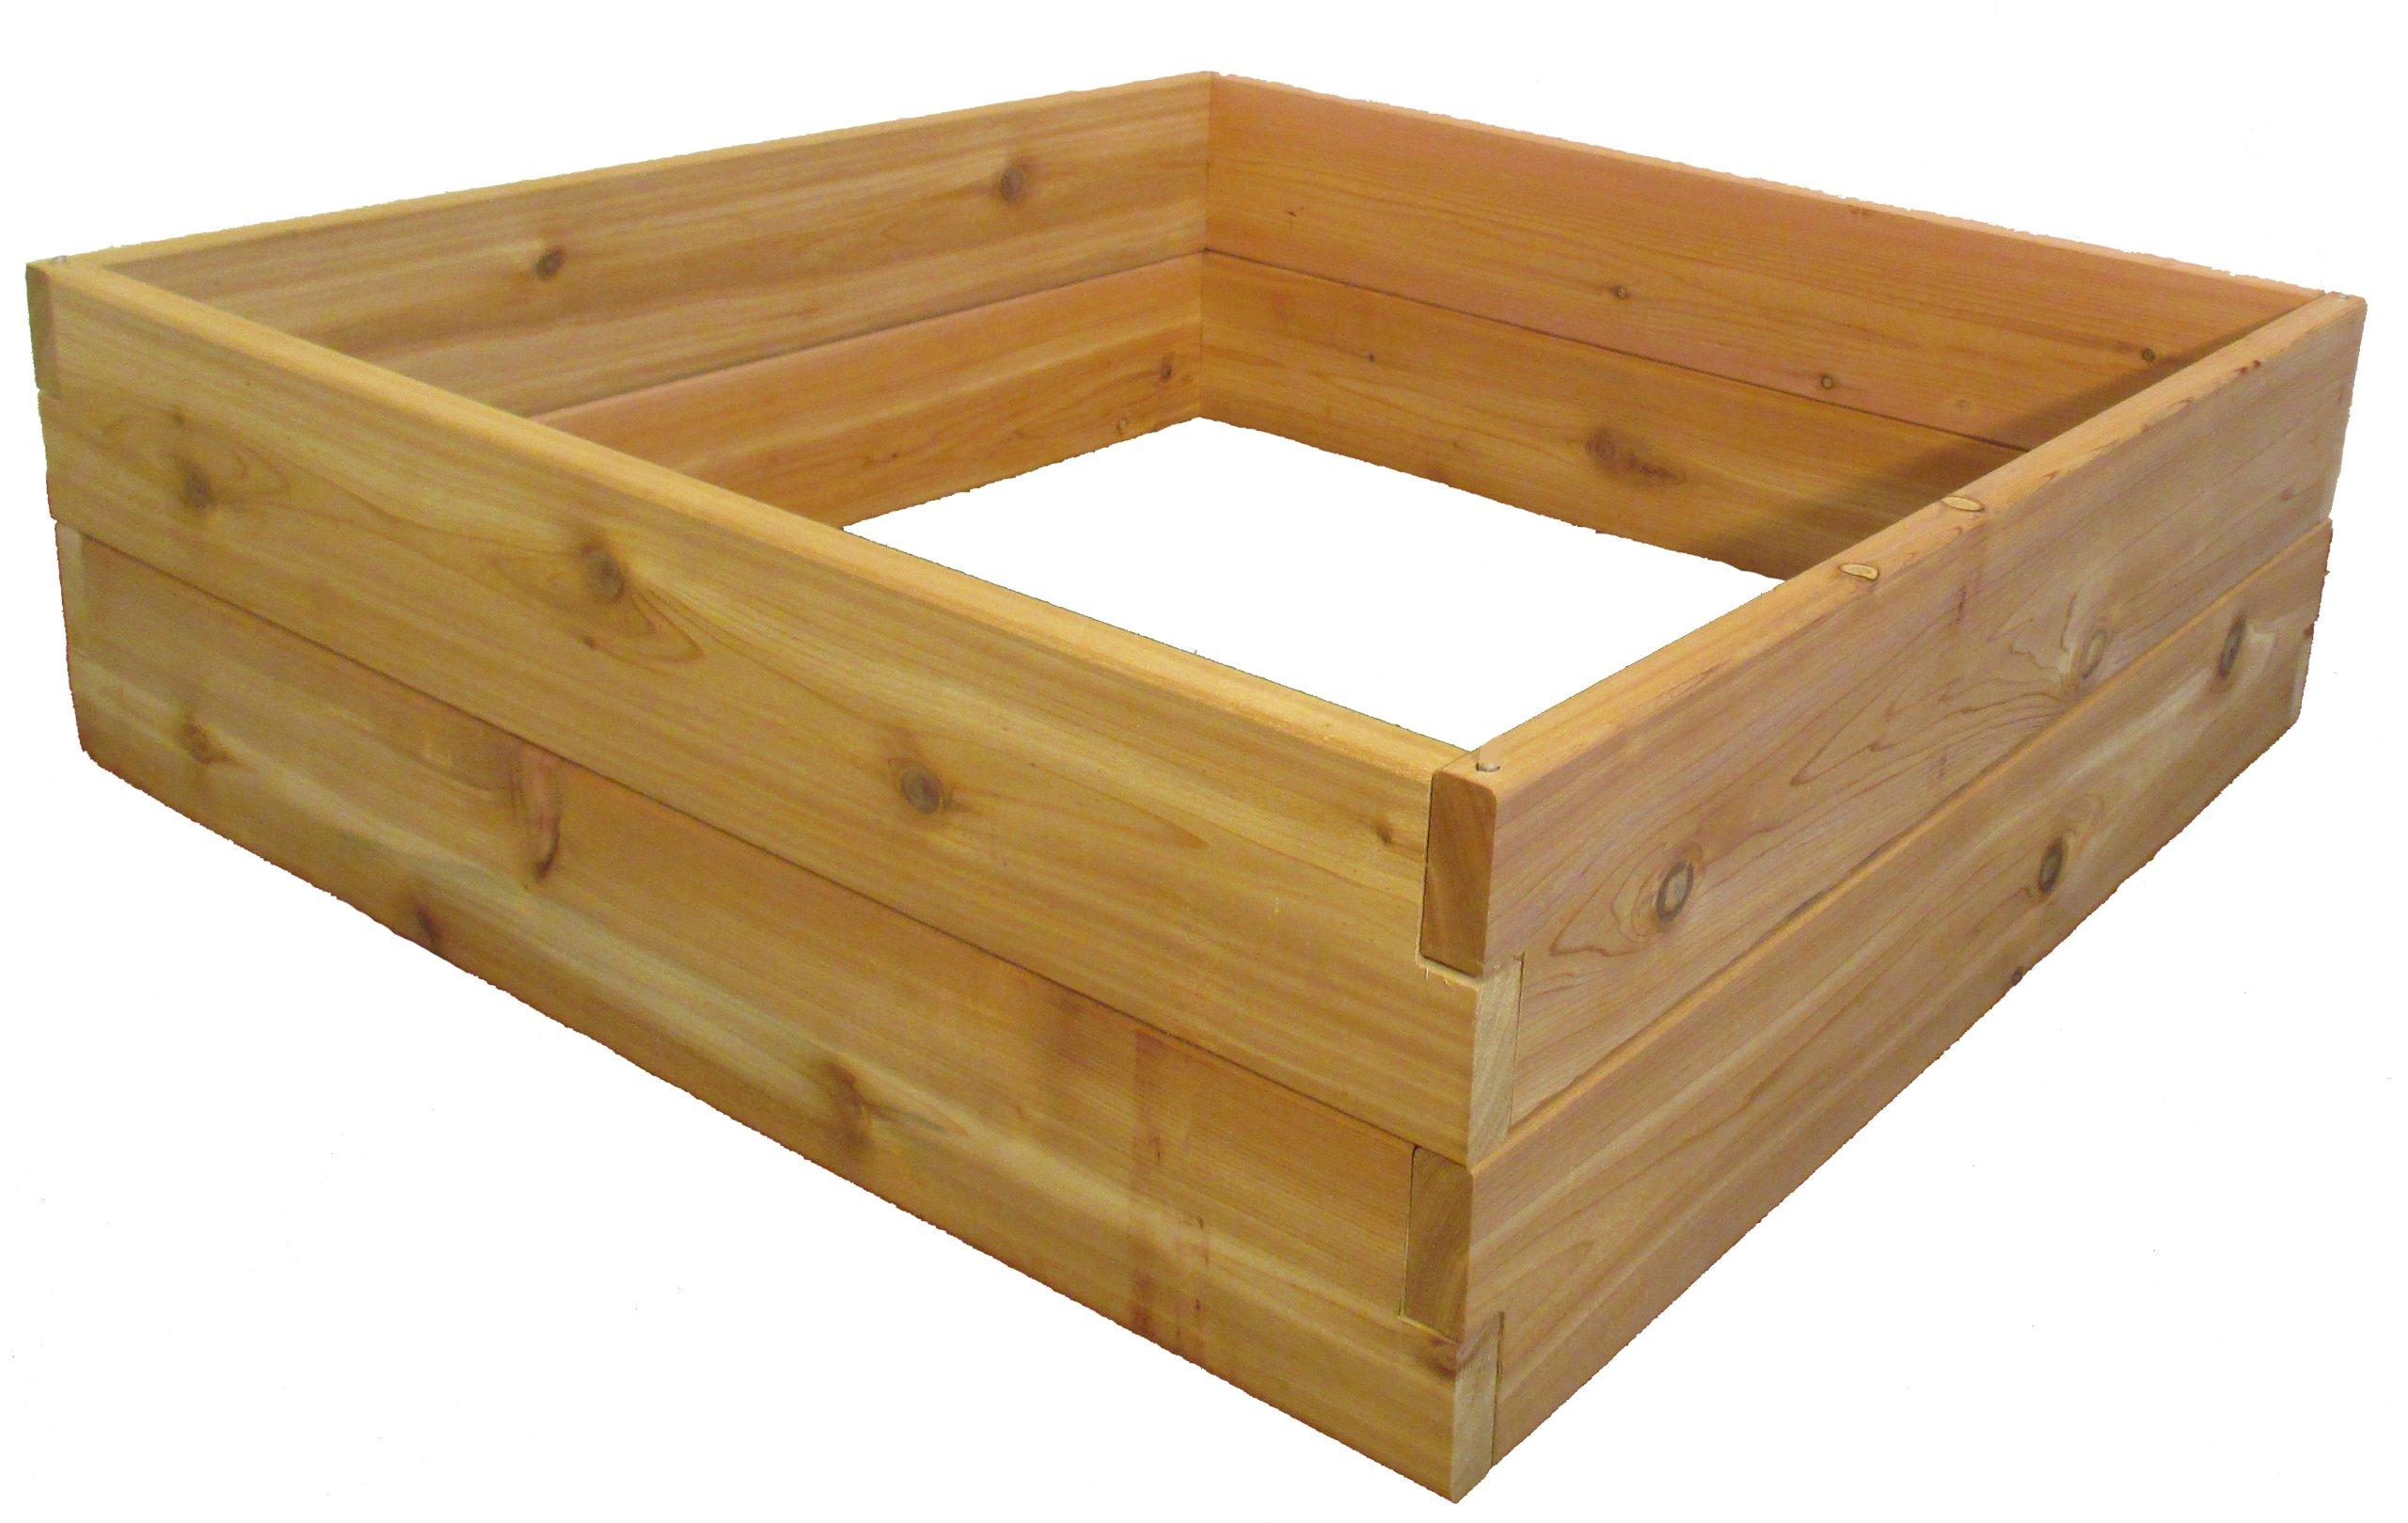 Raised Bed Garden Kit 3'x3'x11'' By Infinite Cedar by Infinite Cedar